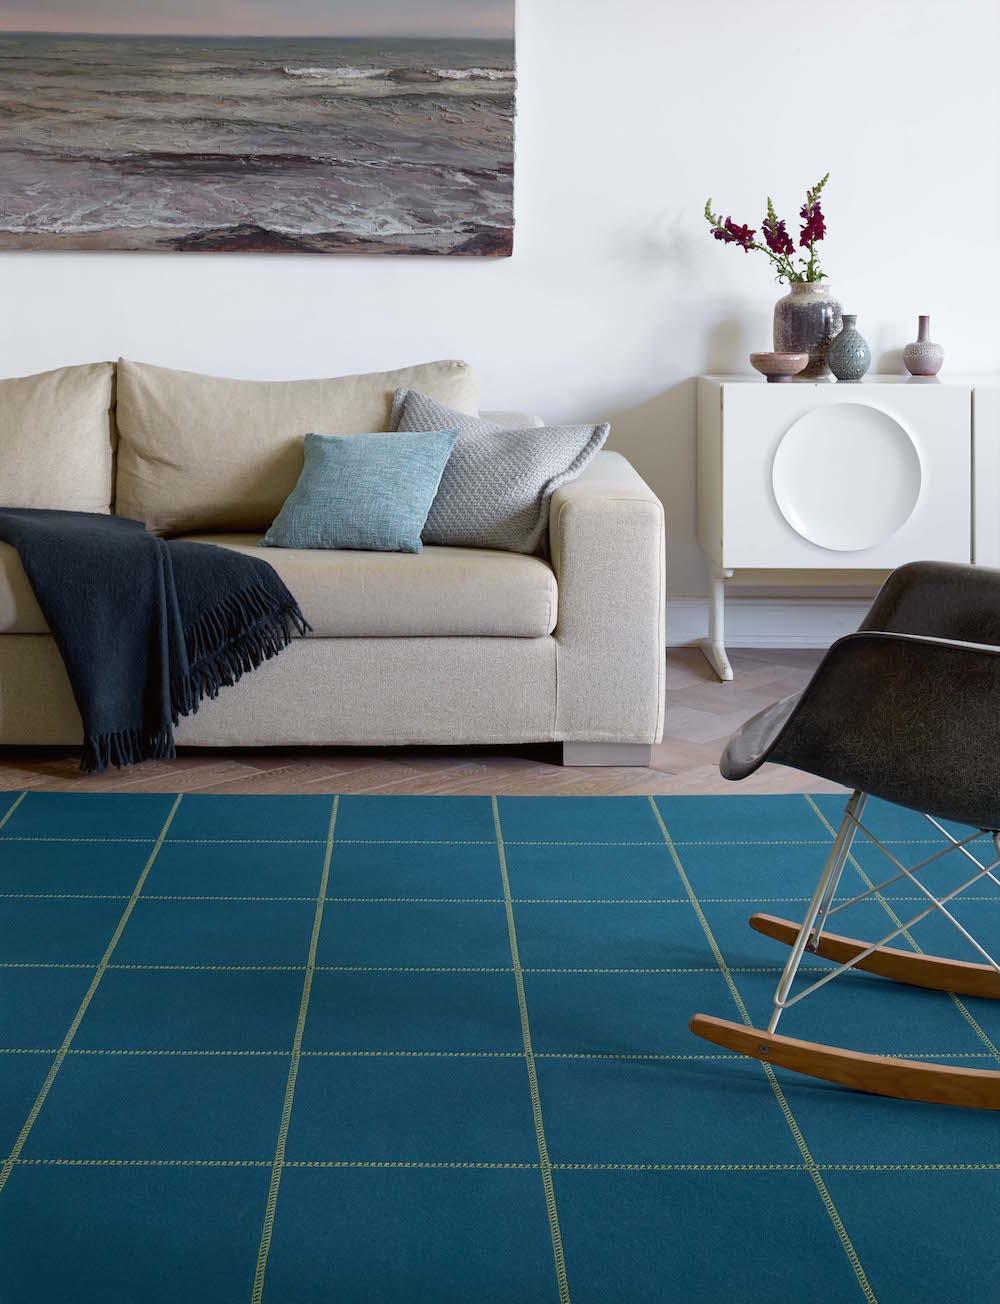 felt affairs collection by jab anstoetz heart home. Black Bedroom Furniture Sets. Home Design Ideas